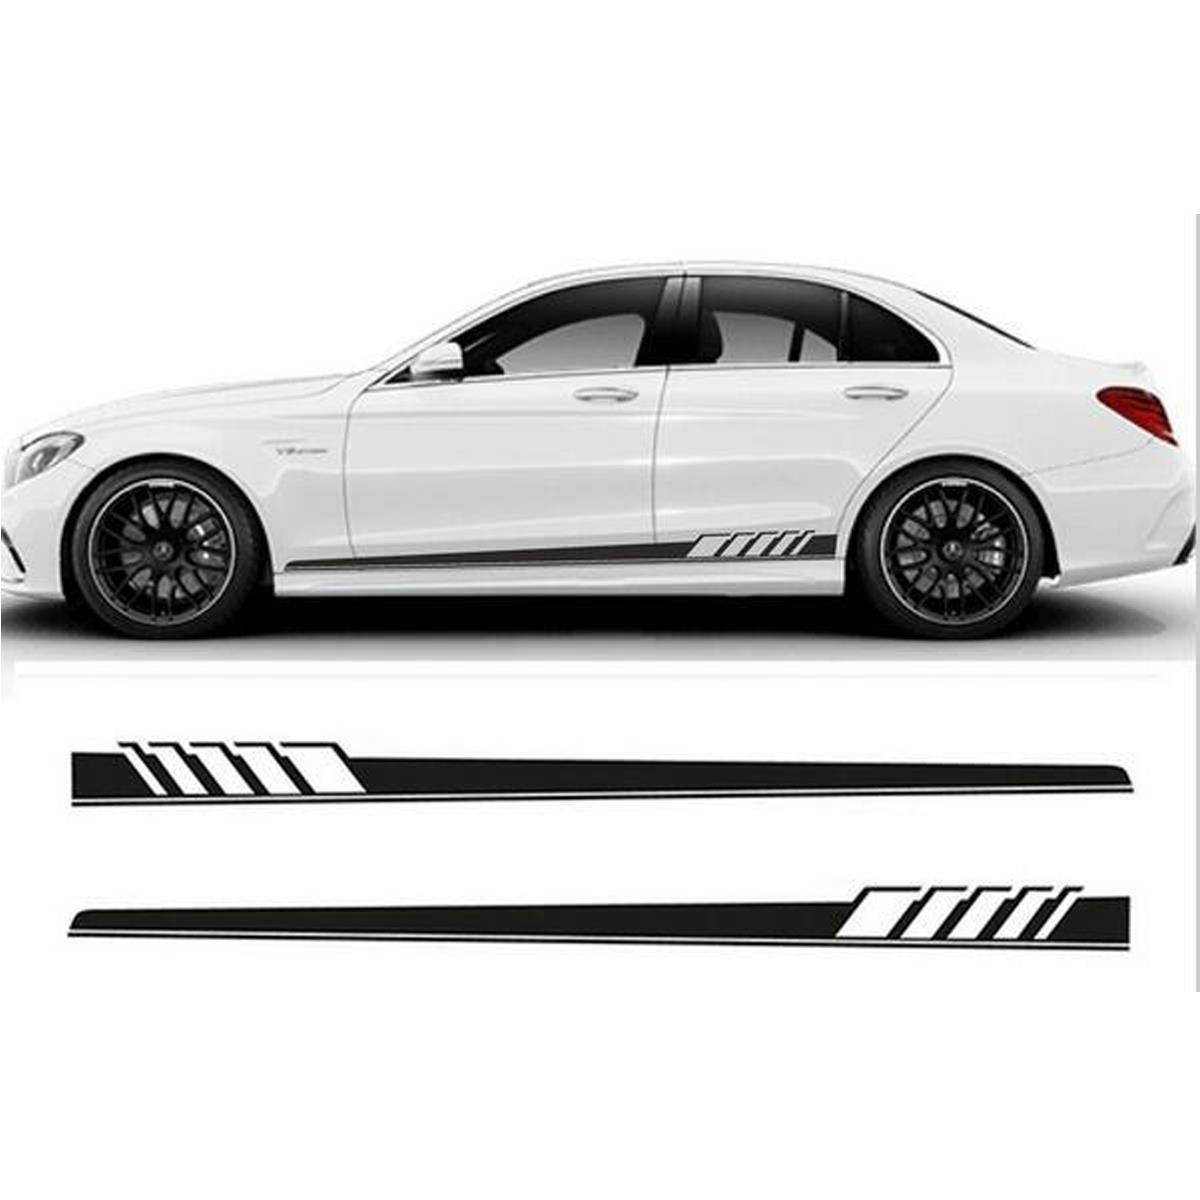 2pcs 220x11 5cm long stripe graphics car stickers off road side body vinyl decals black white blue sale